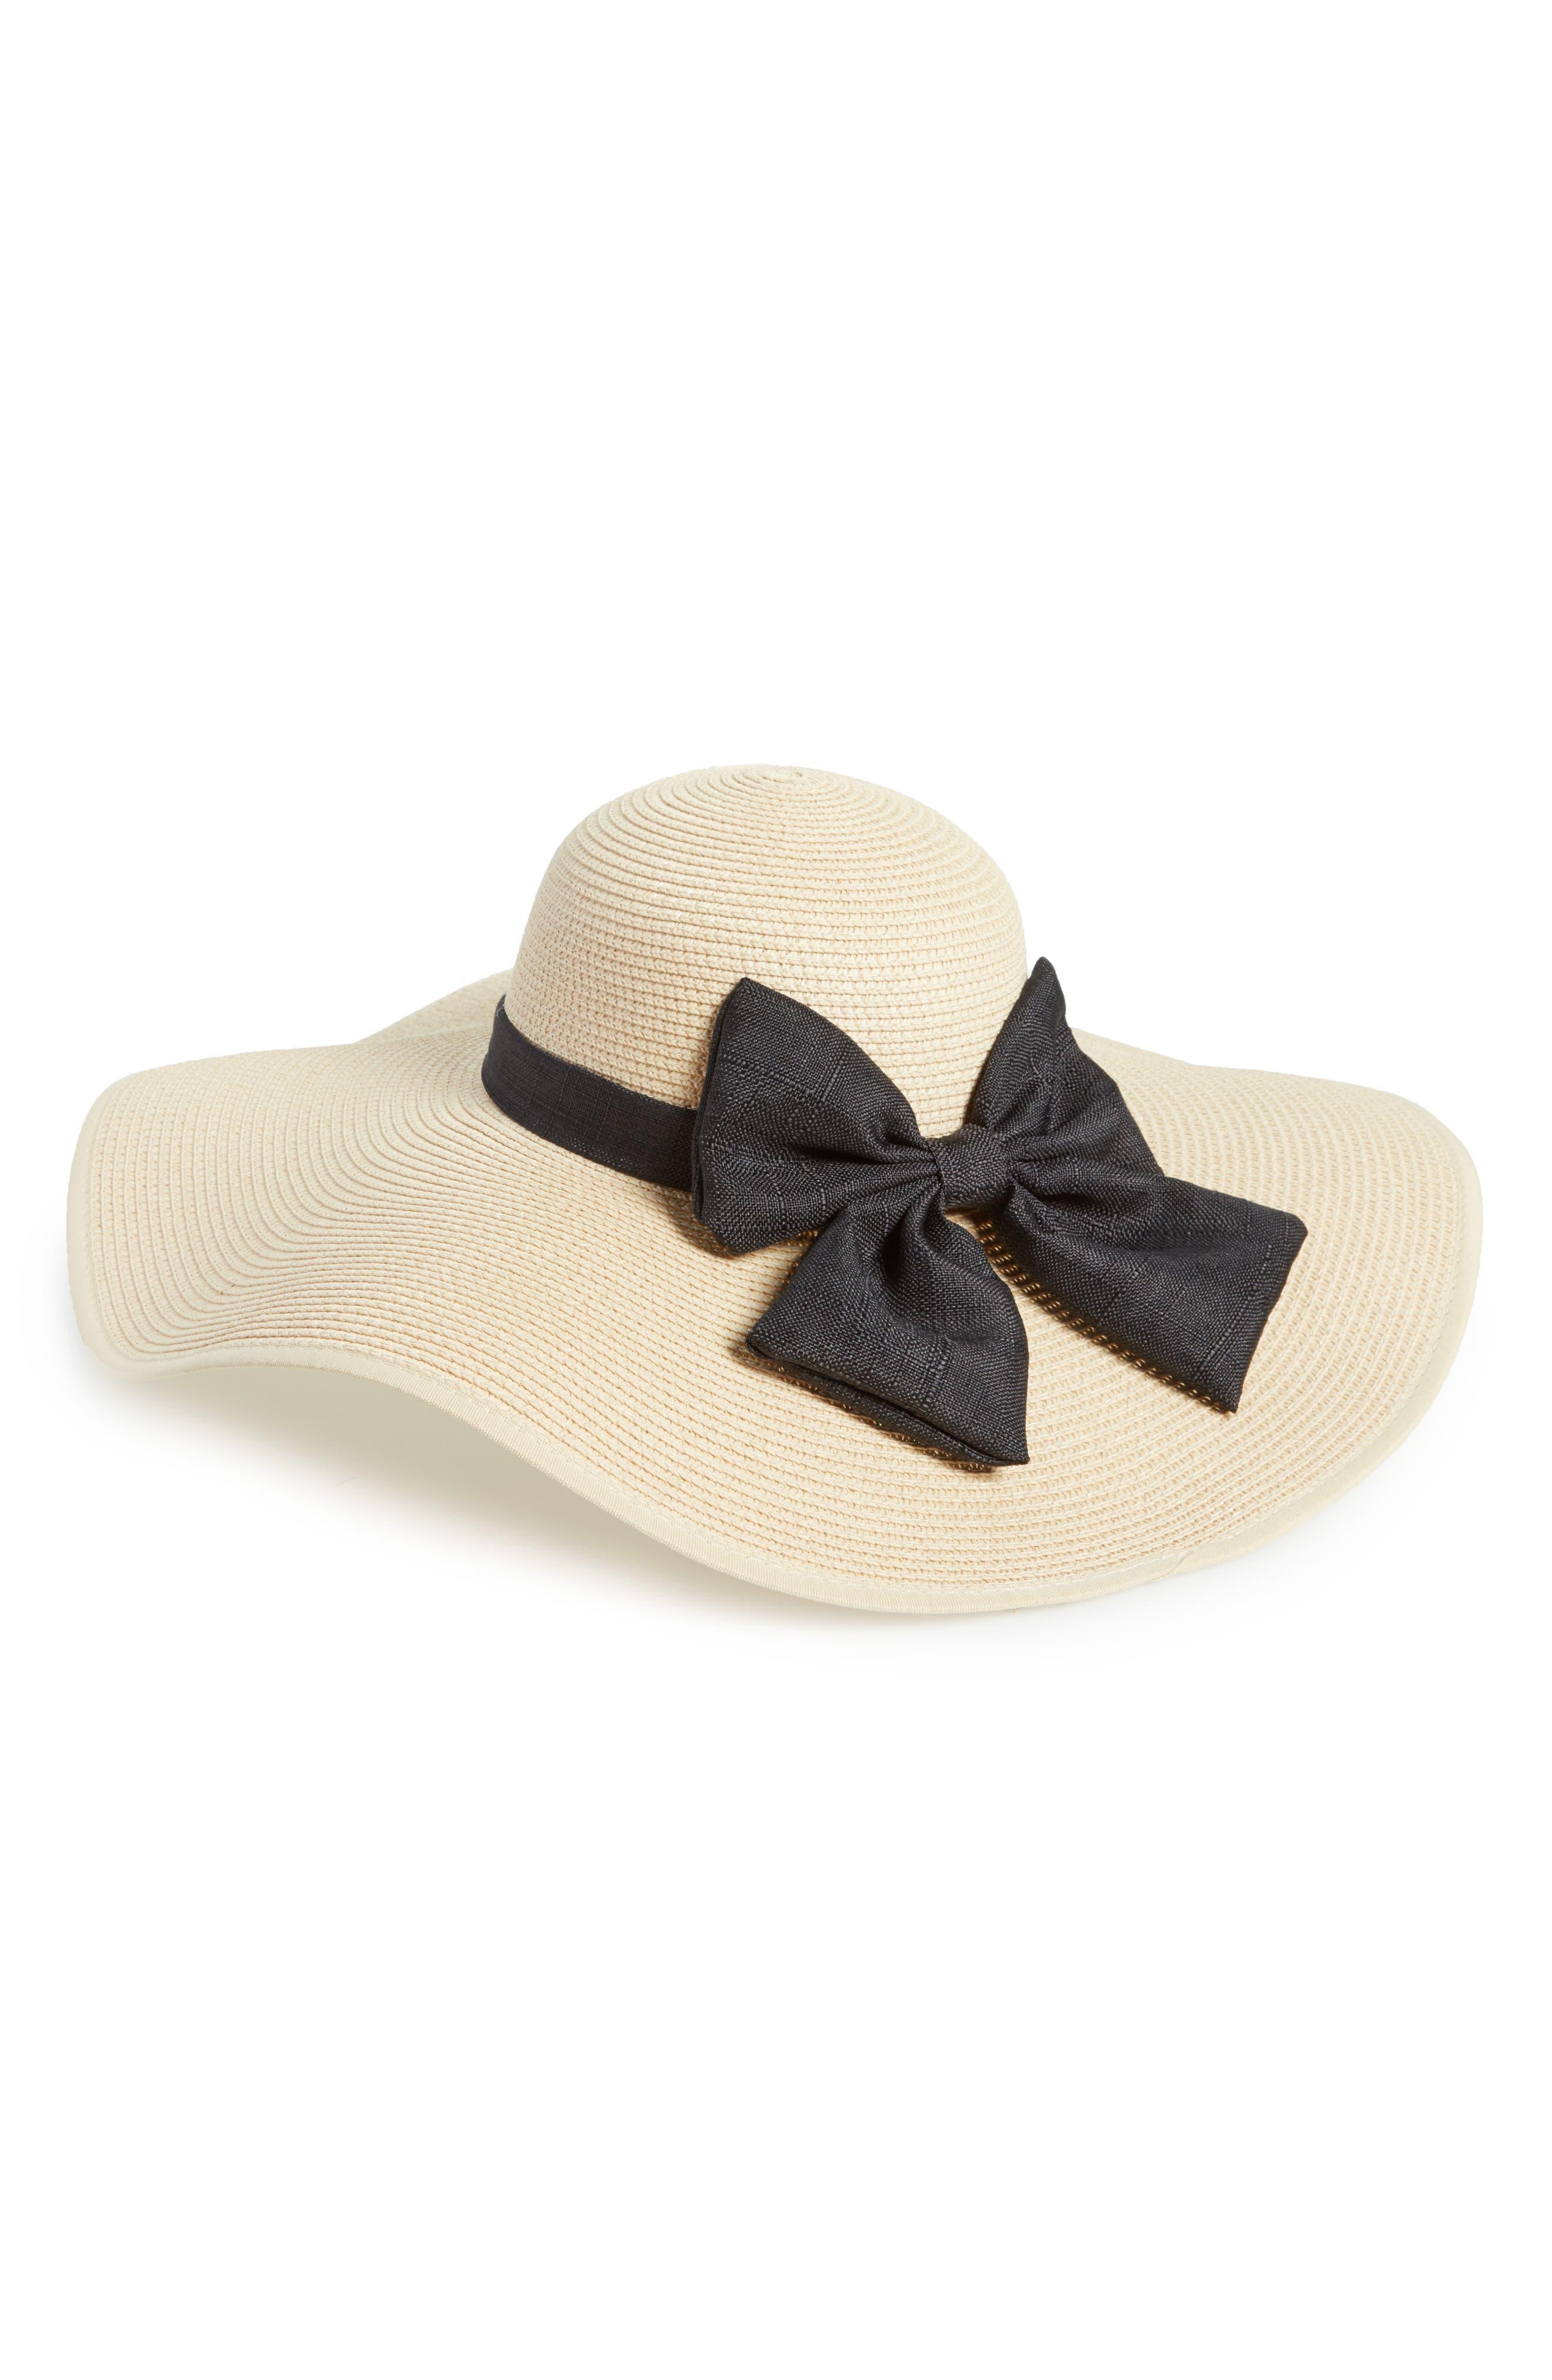 BP. Oversize Bow Floppy Straw Hat